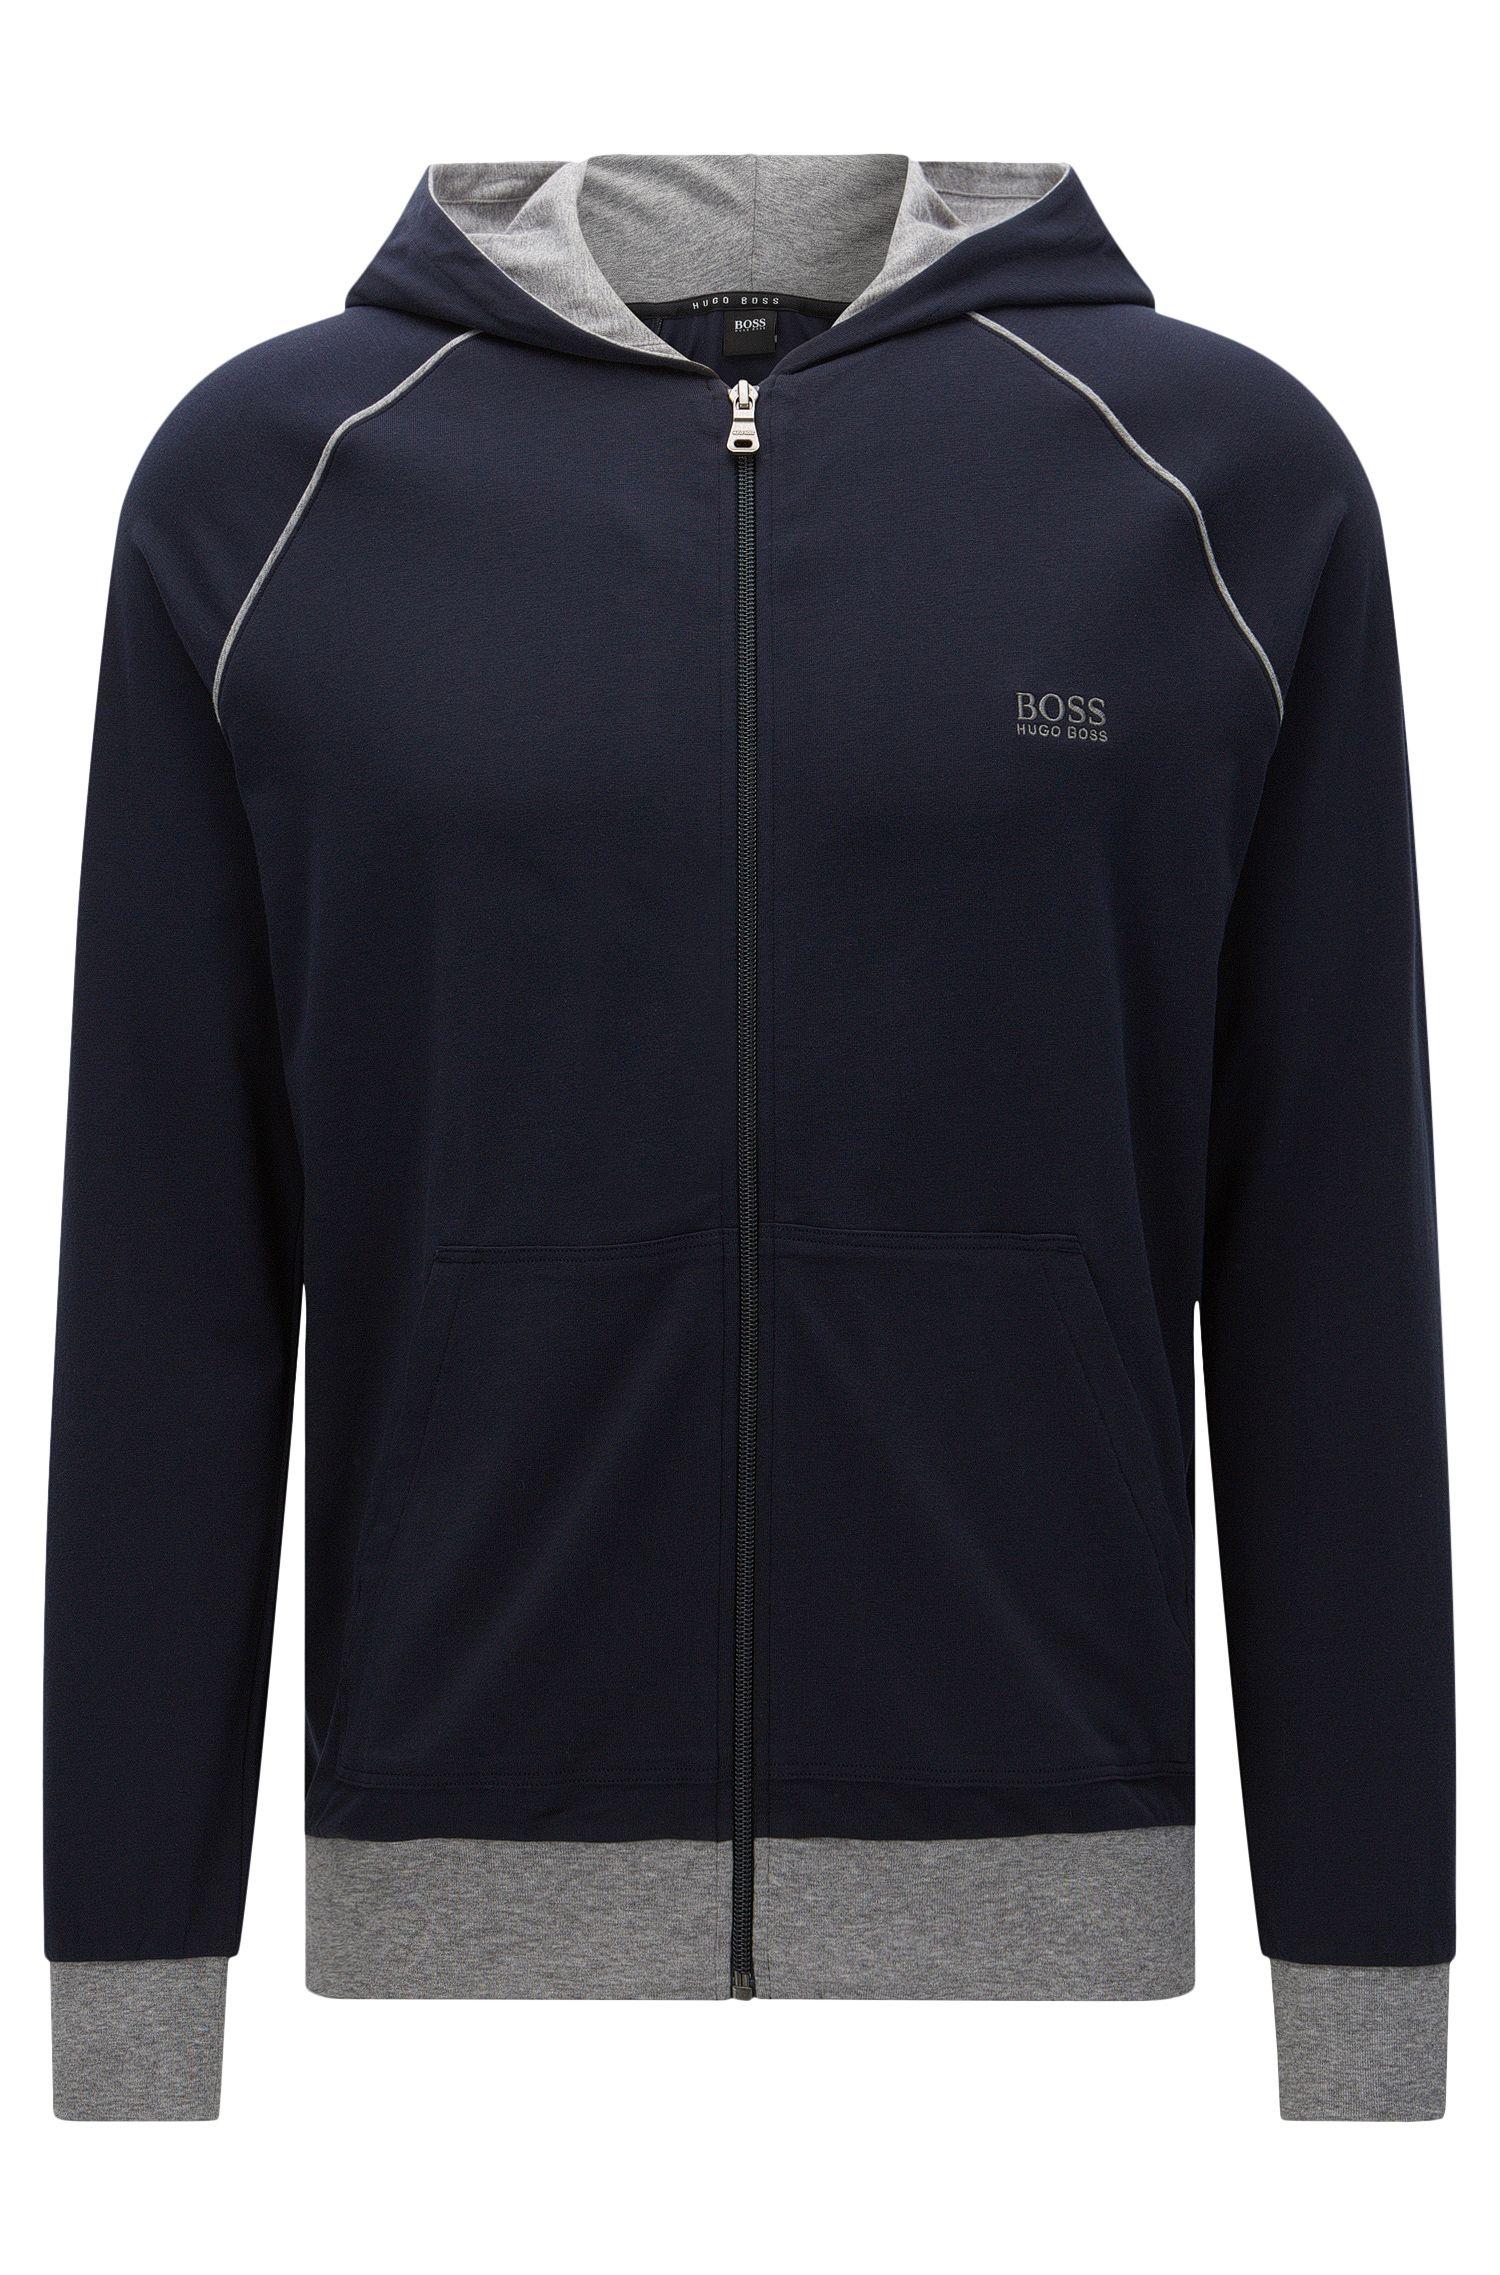 Regular-Fit Sweatshirt-Jacke aus Stretch-Baumwolle mit Kapuze: 'Jacket Hooded'